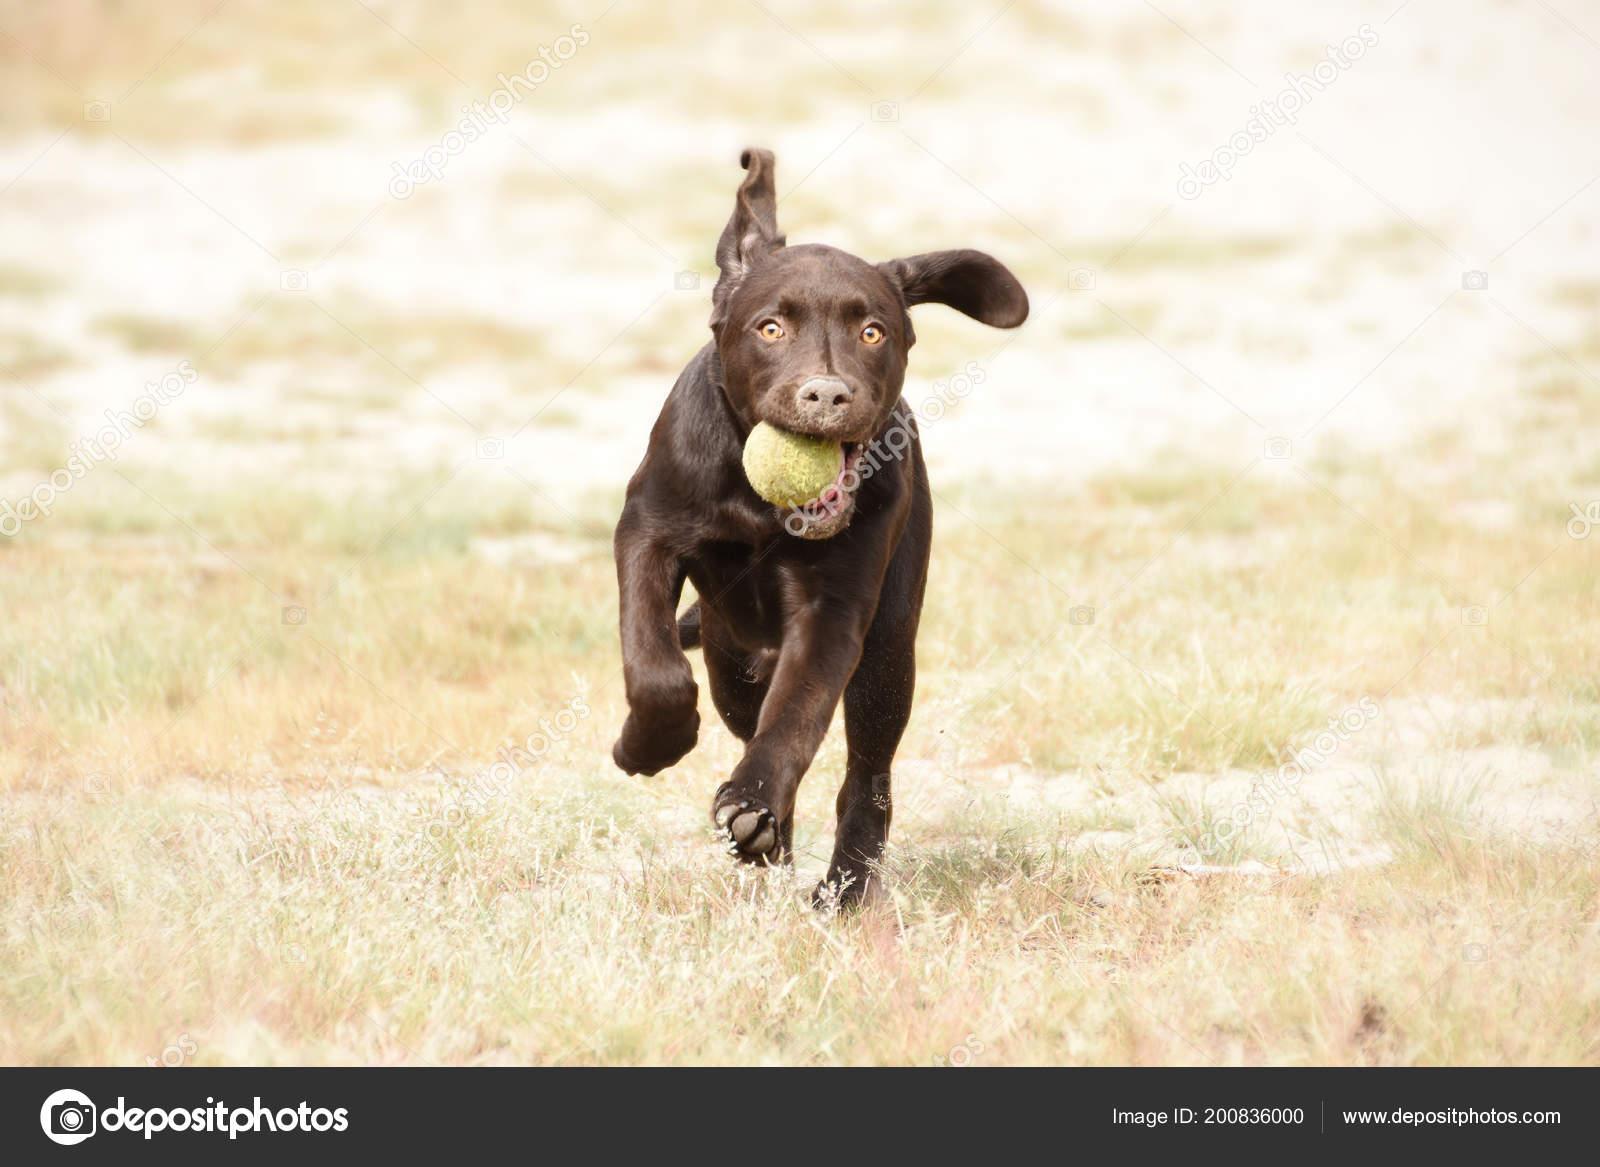 Cute Brown Labrador Puppy Dog Running Ball His Mouth Green Stock